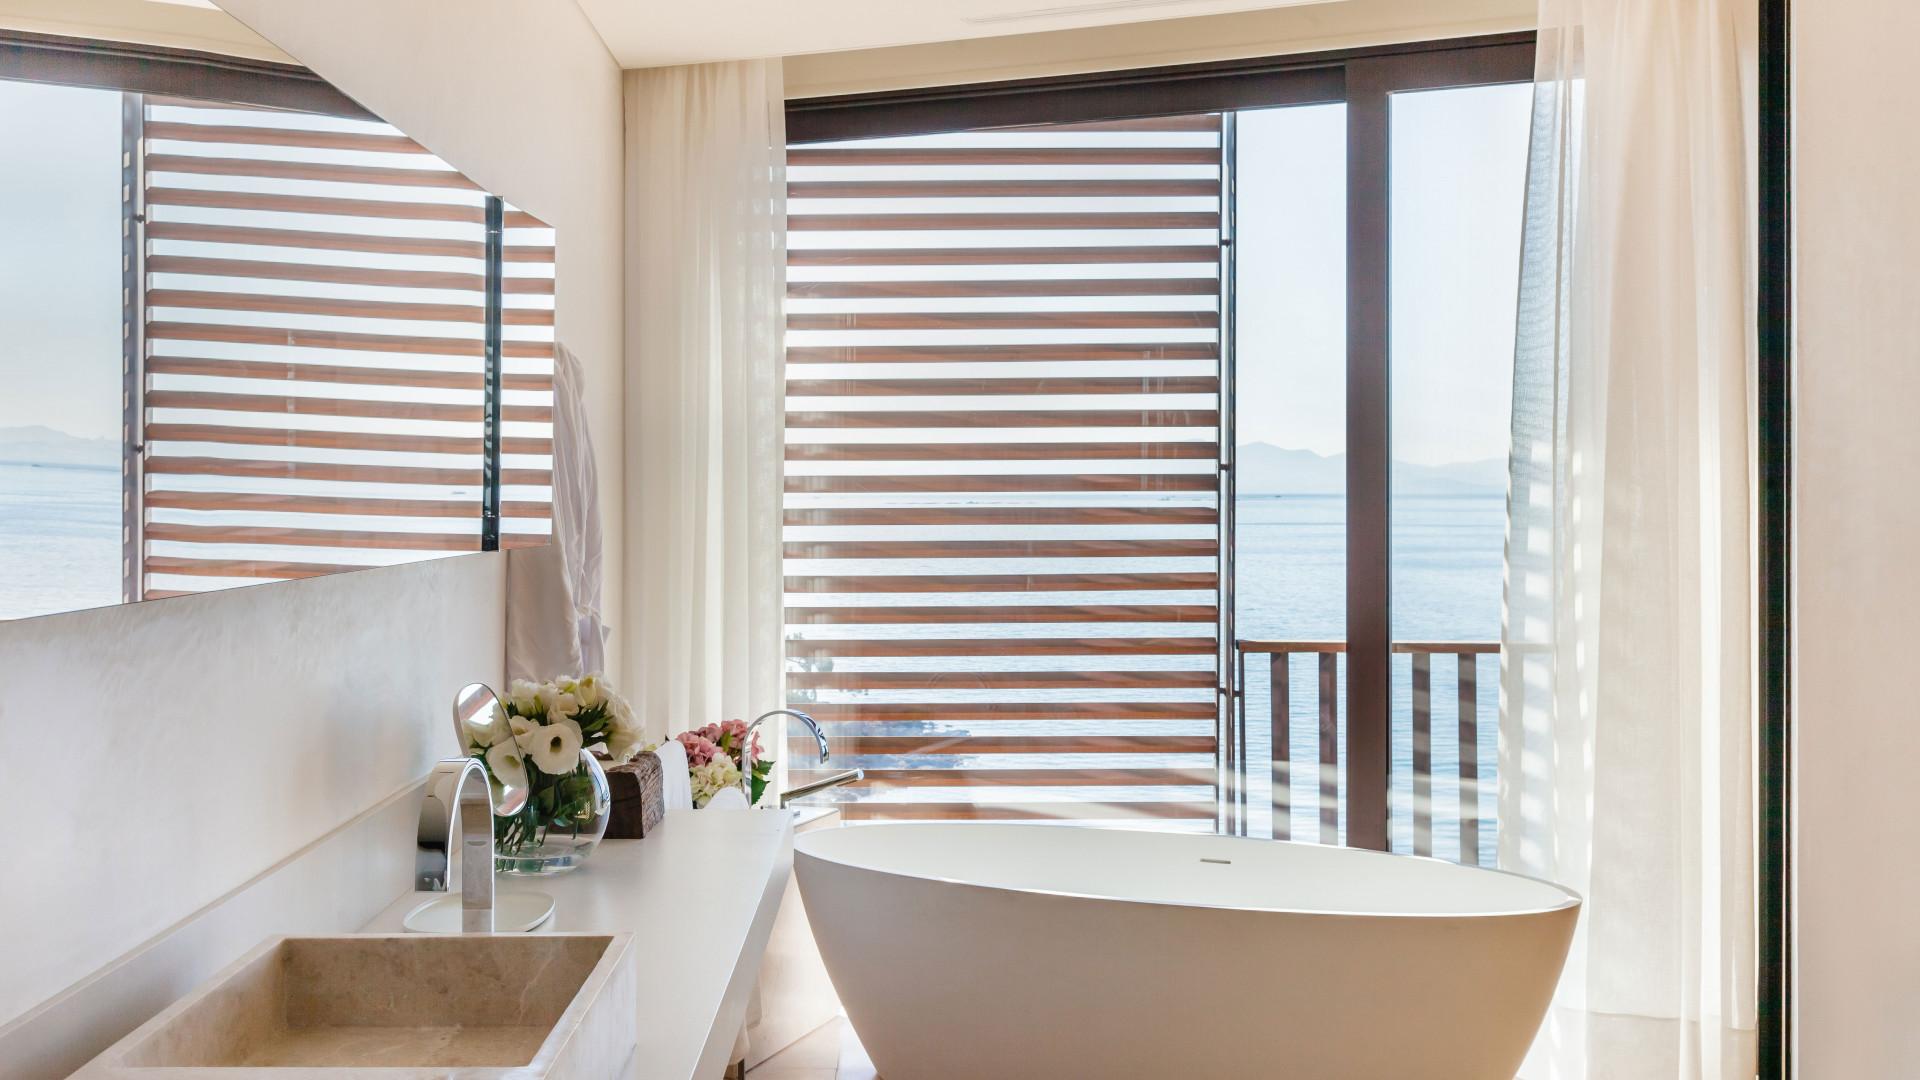 Aegean sea view from bathroom at Kaplankaya hotel